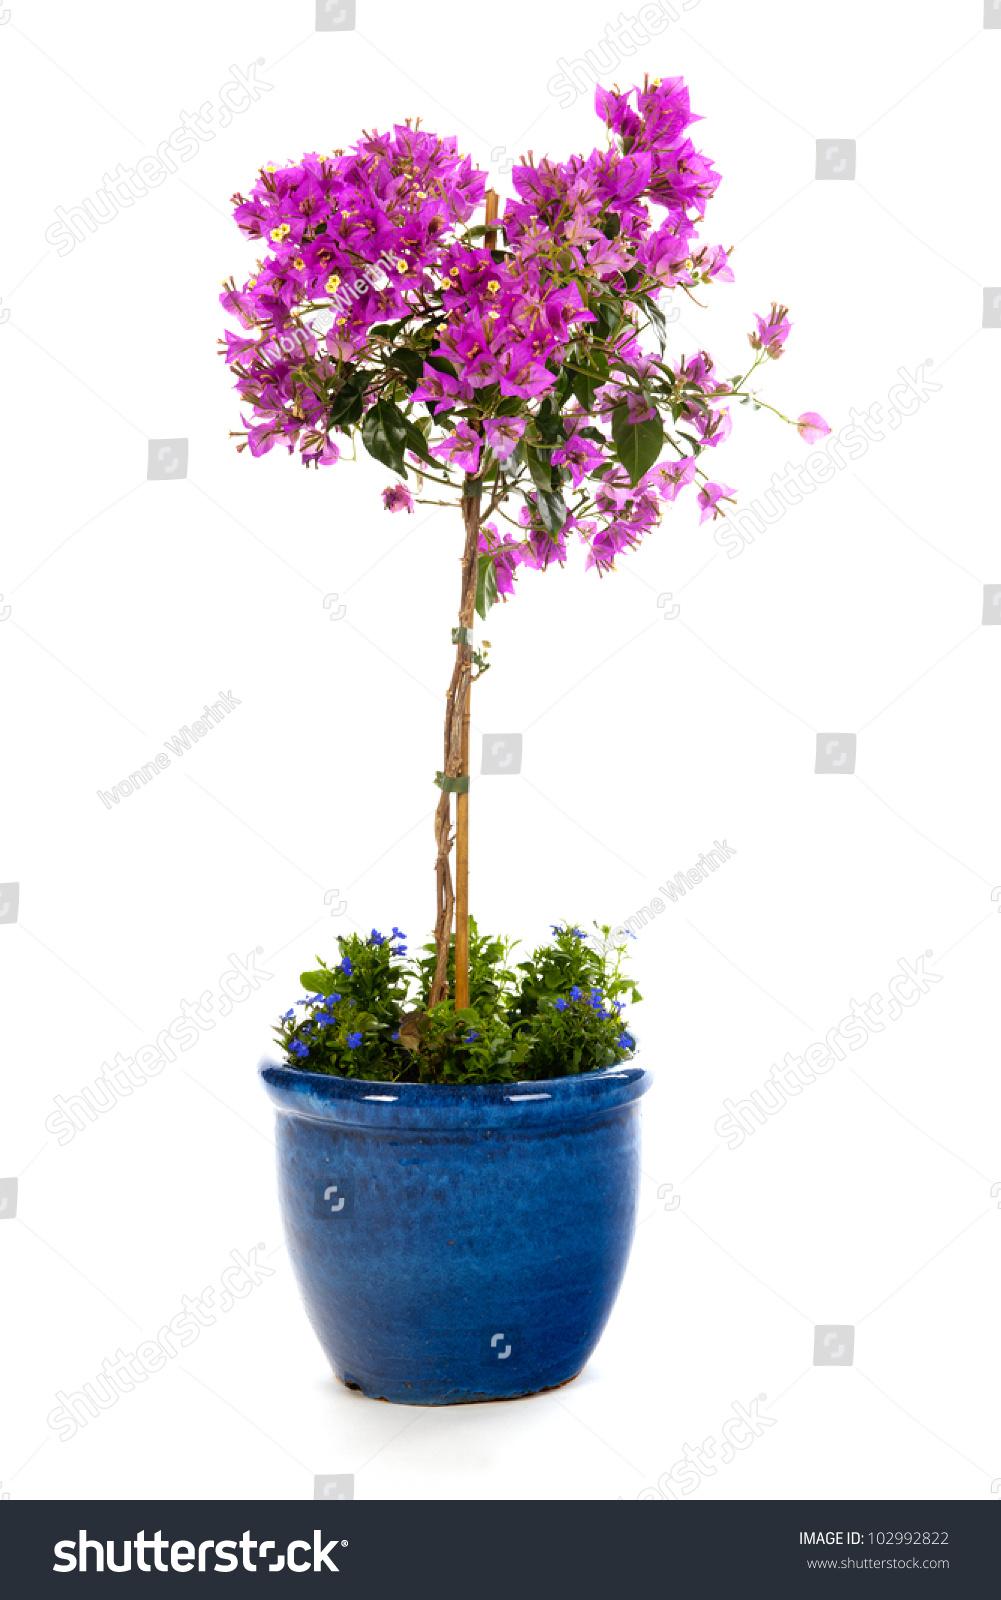 Purple Bougainvillea In Blue Flower Pot With Lobelia ...